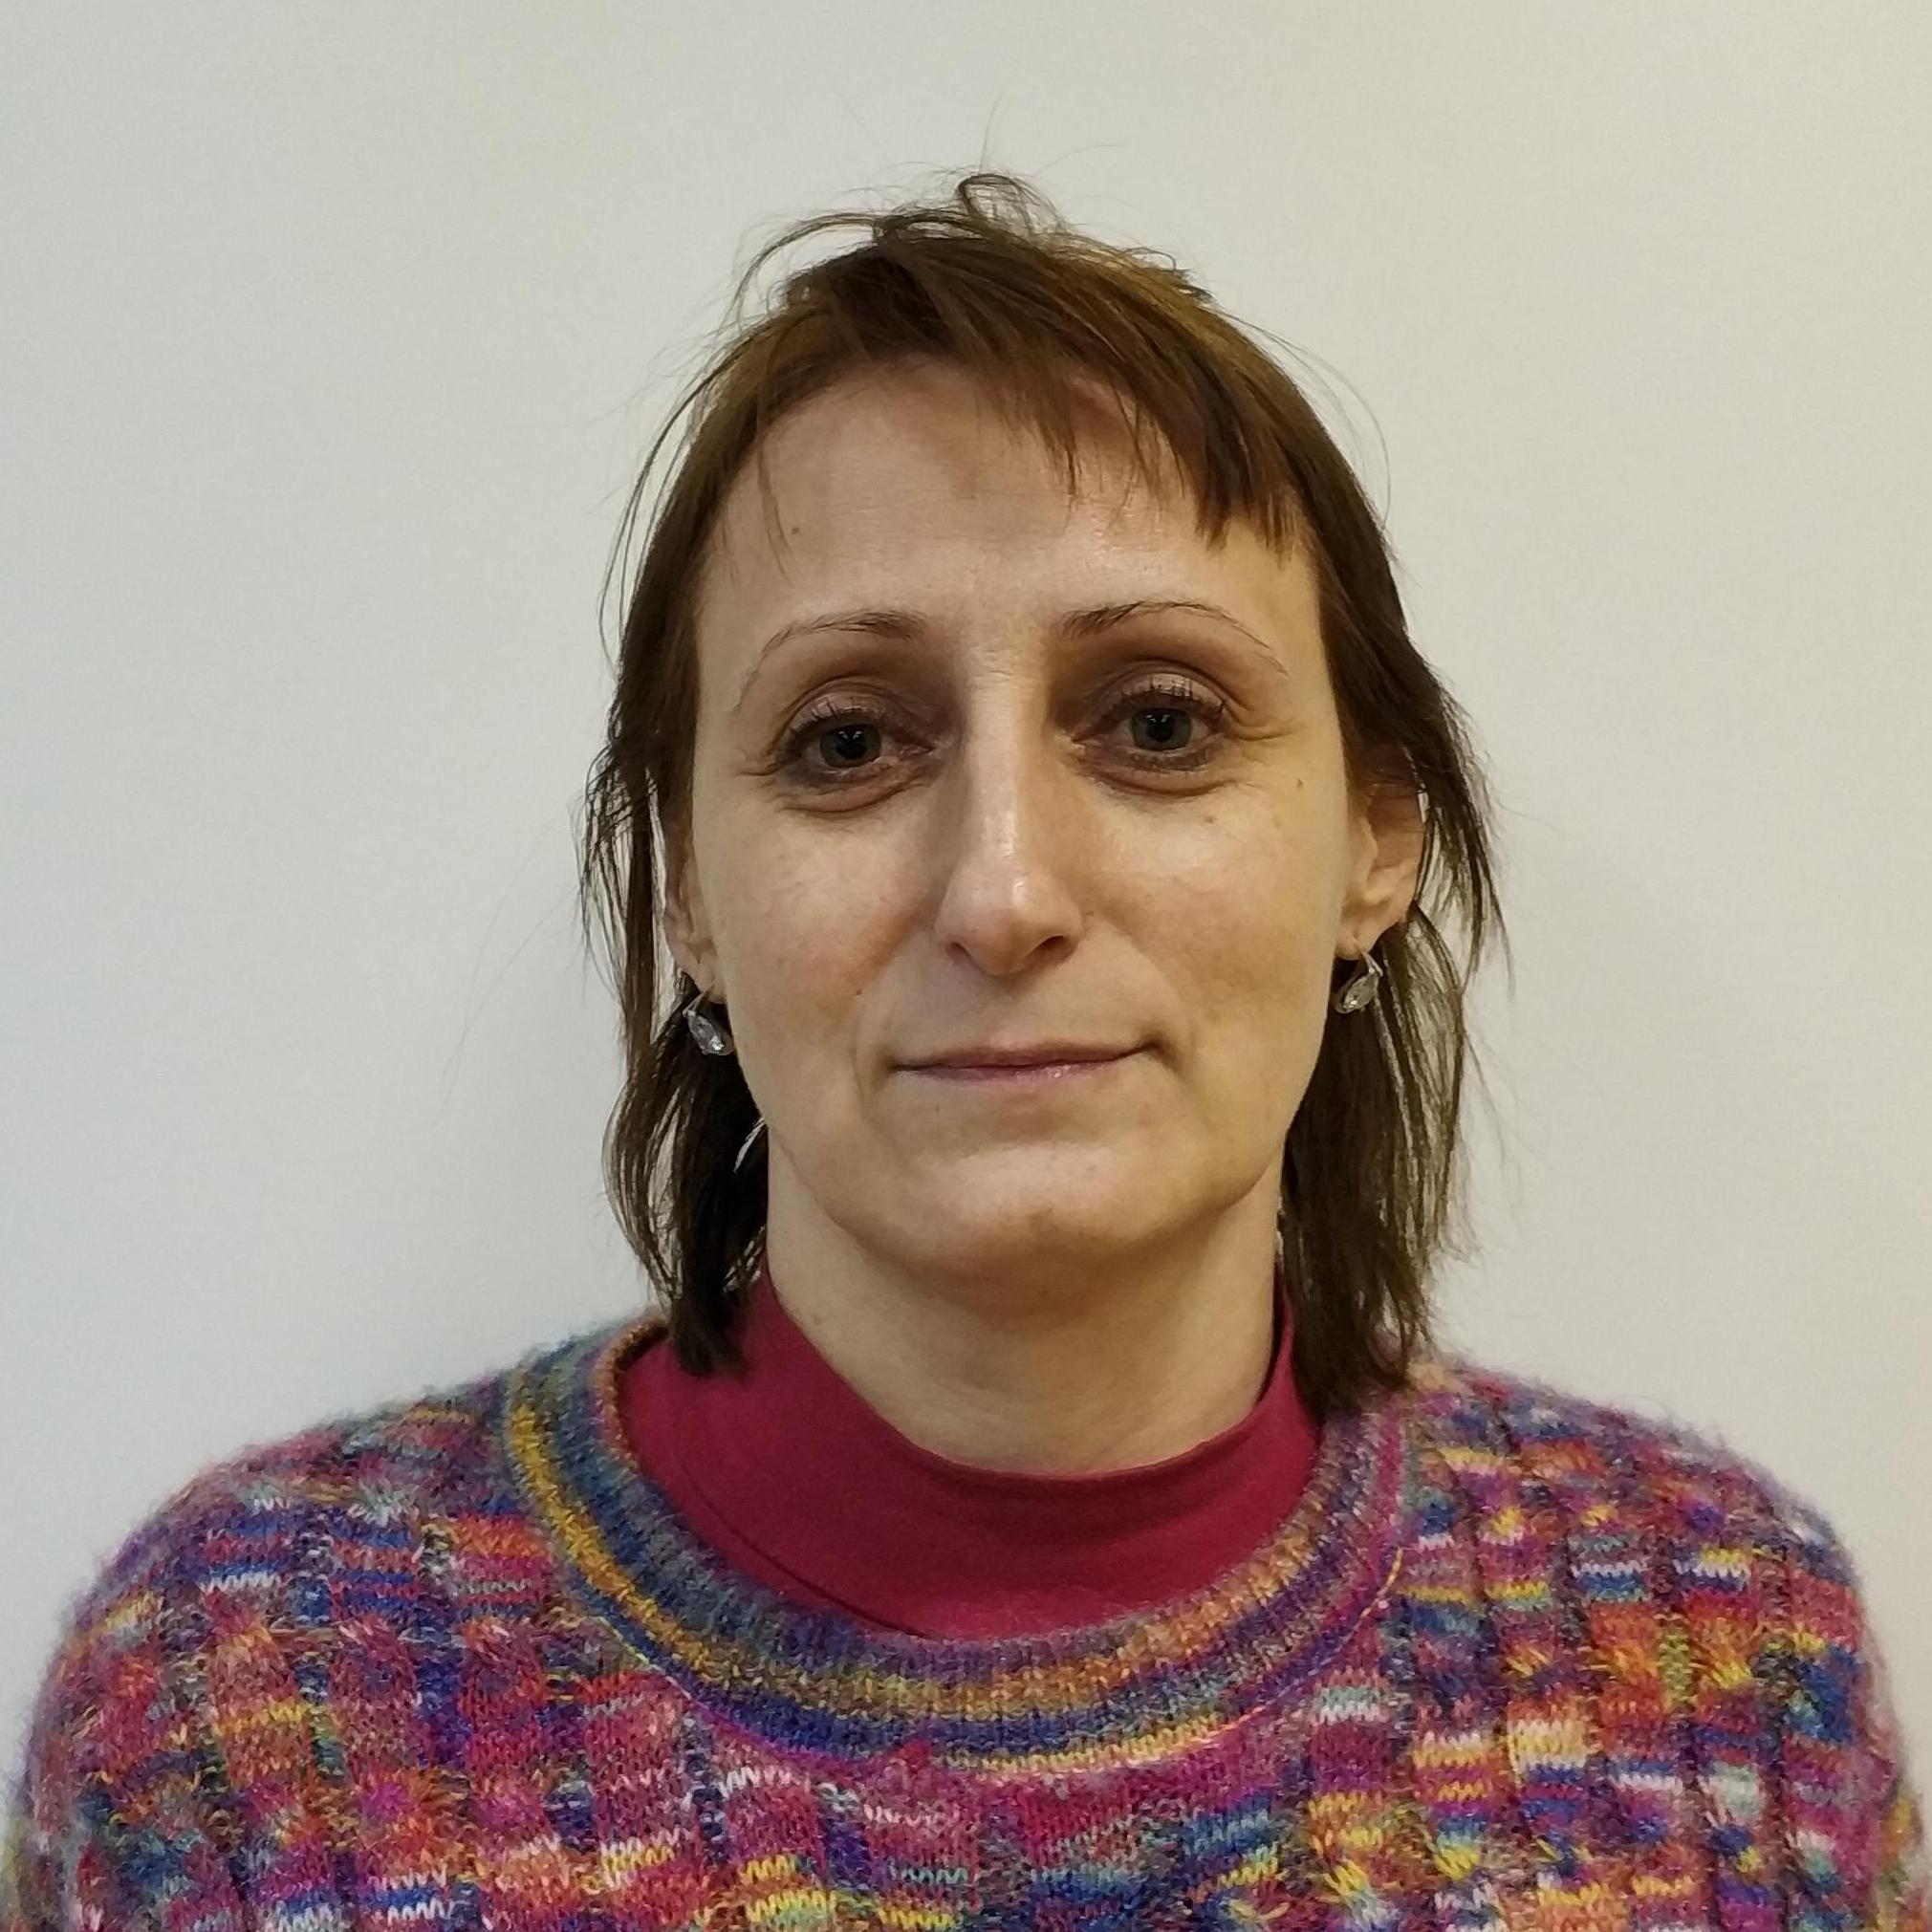 Томашевская Виктория Вячеславовна